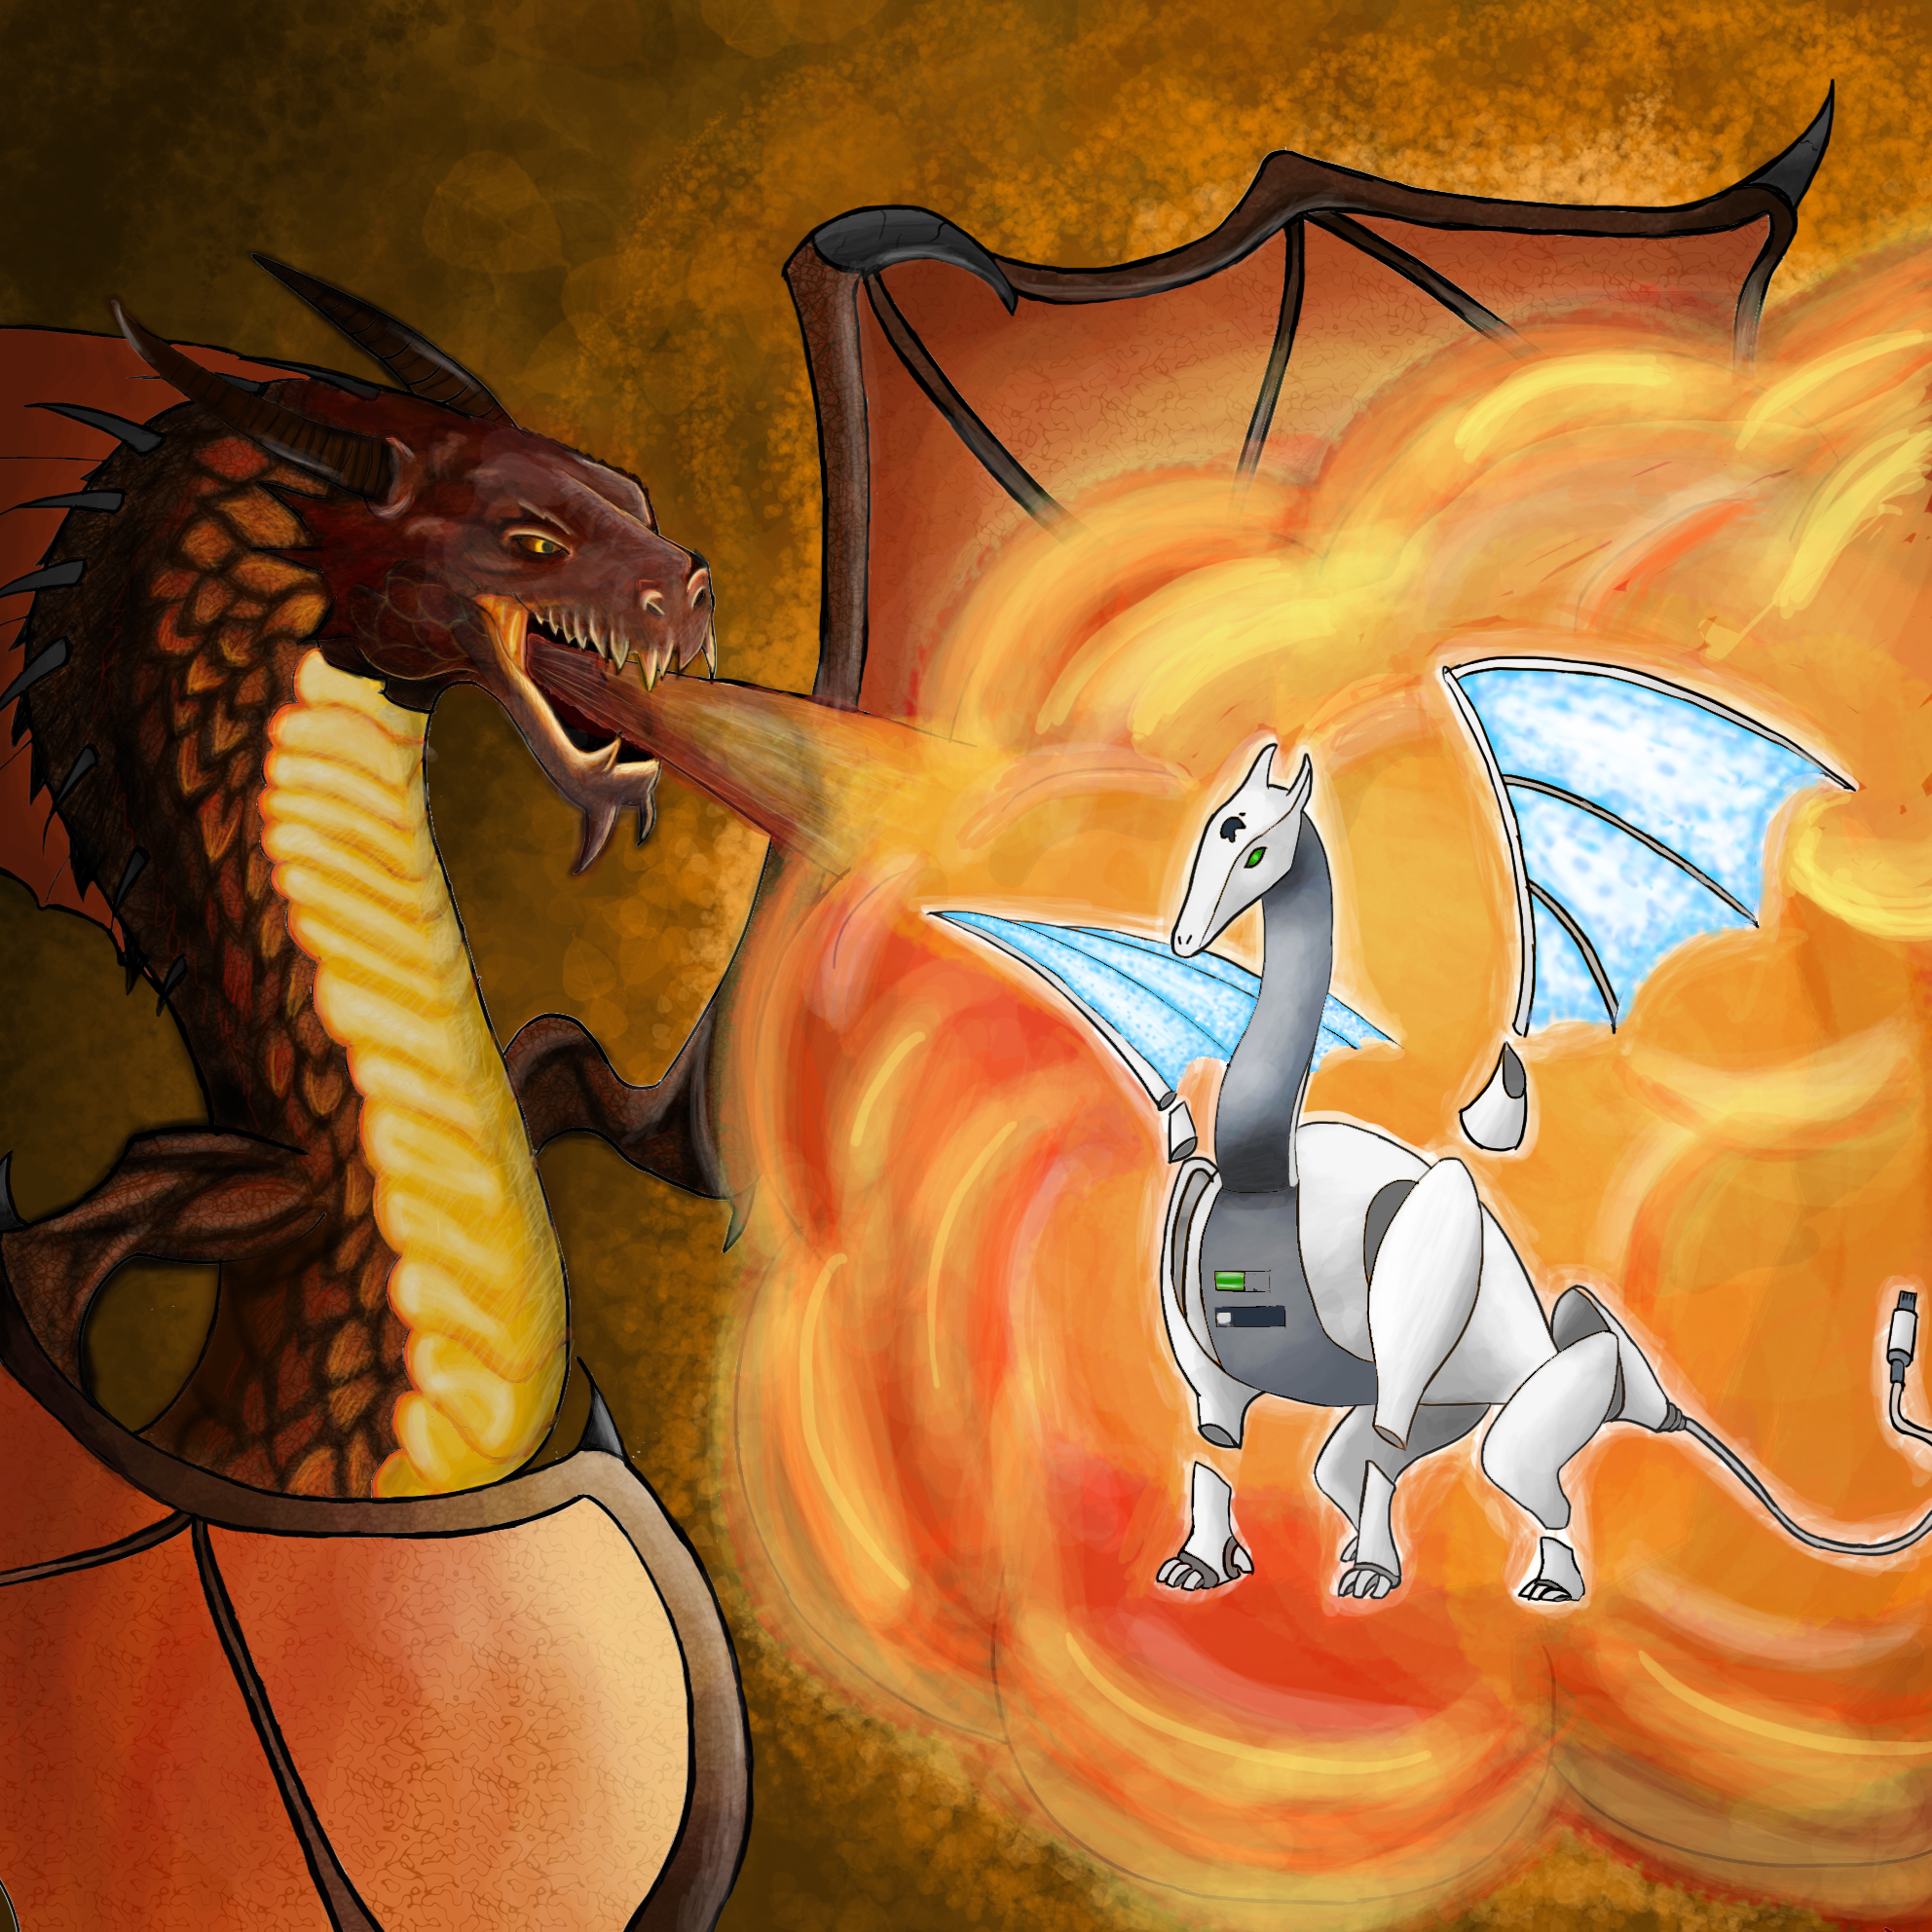 Traditional Dragon Vs Apple iDragon